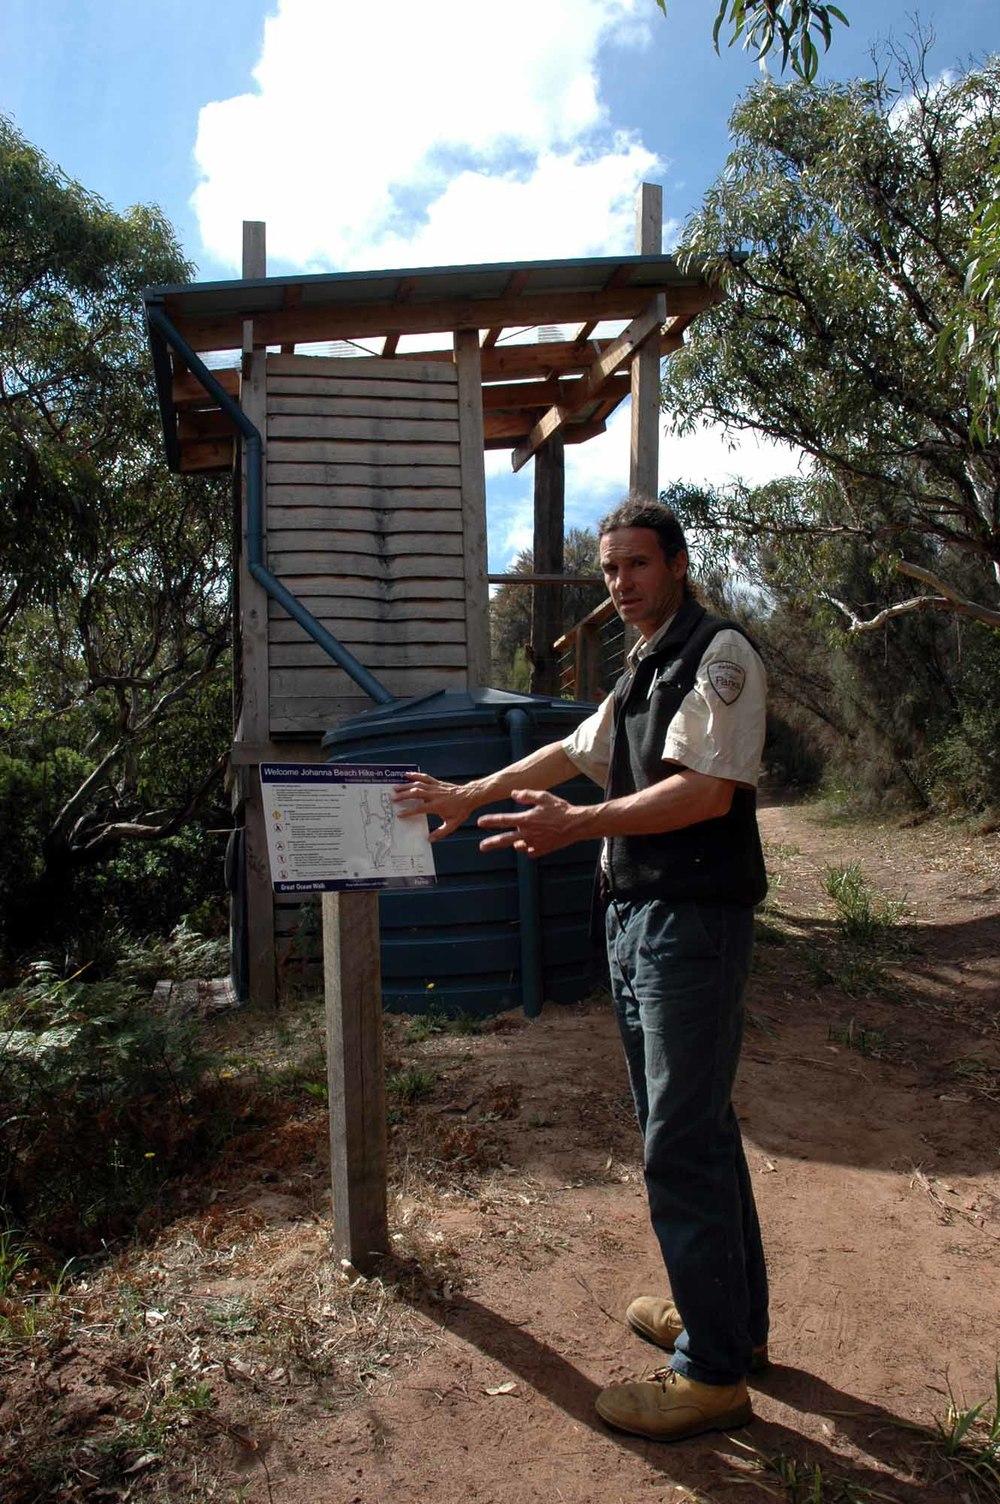 Brett Manders erklärt die Camp-Regeln